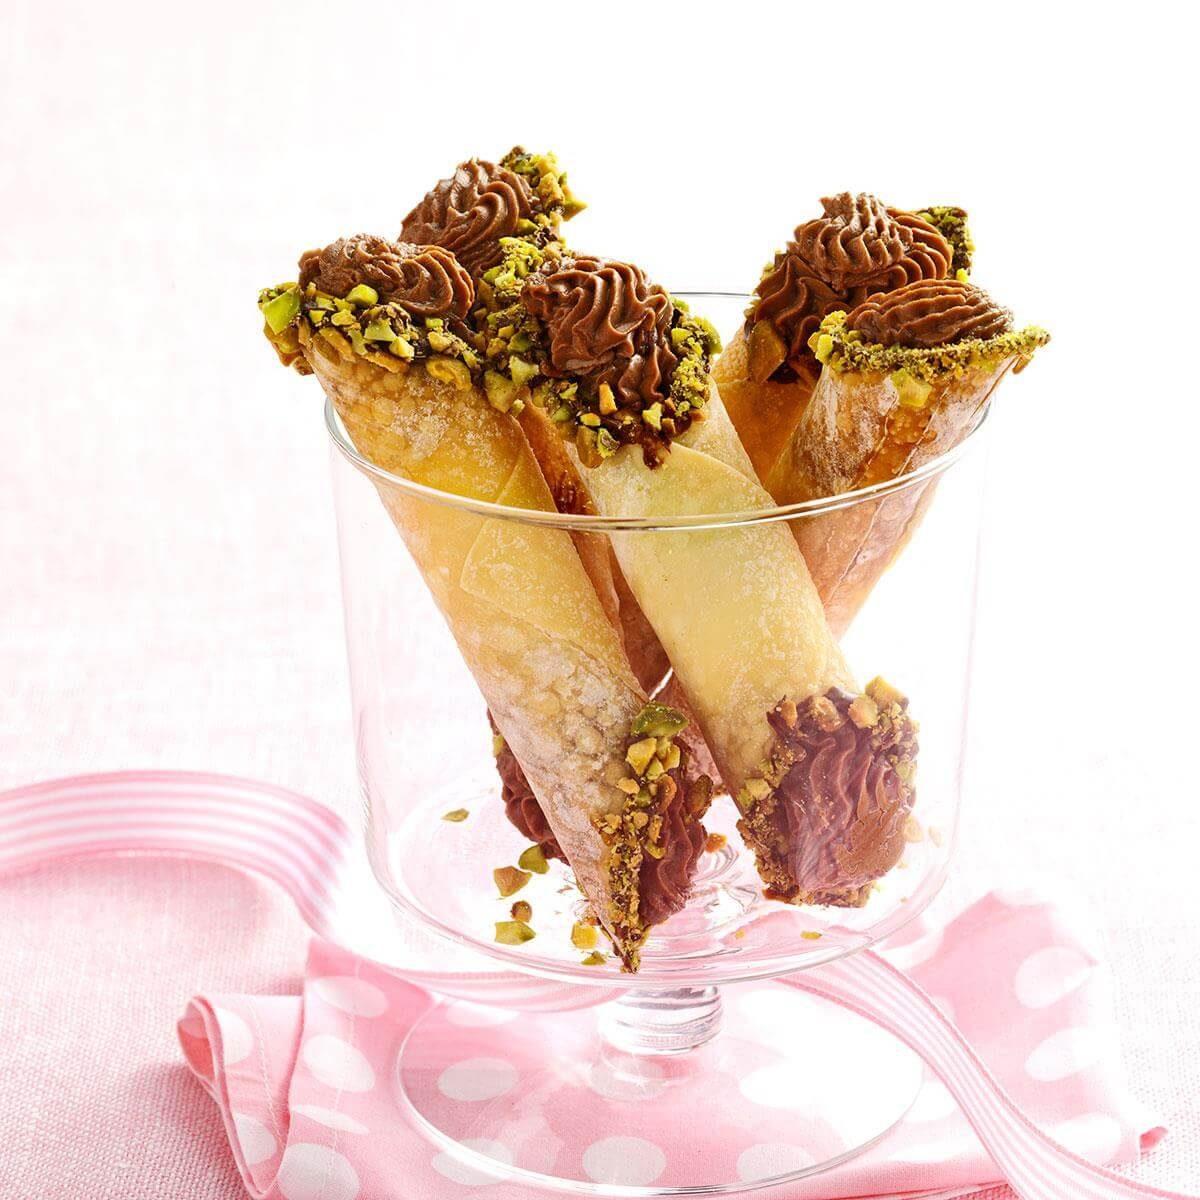 Cannoli Kitchen: Chocolate Anise Cannoli Recipe